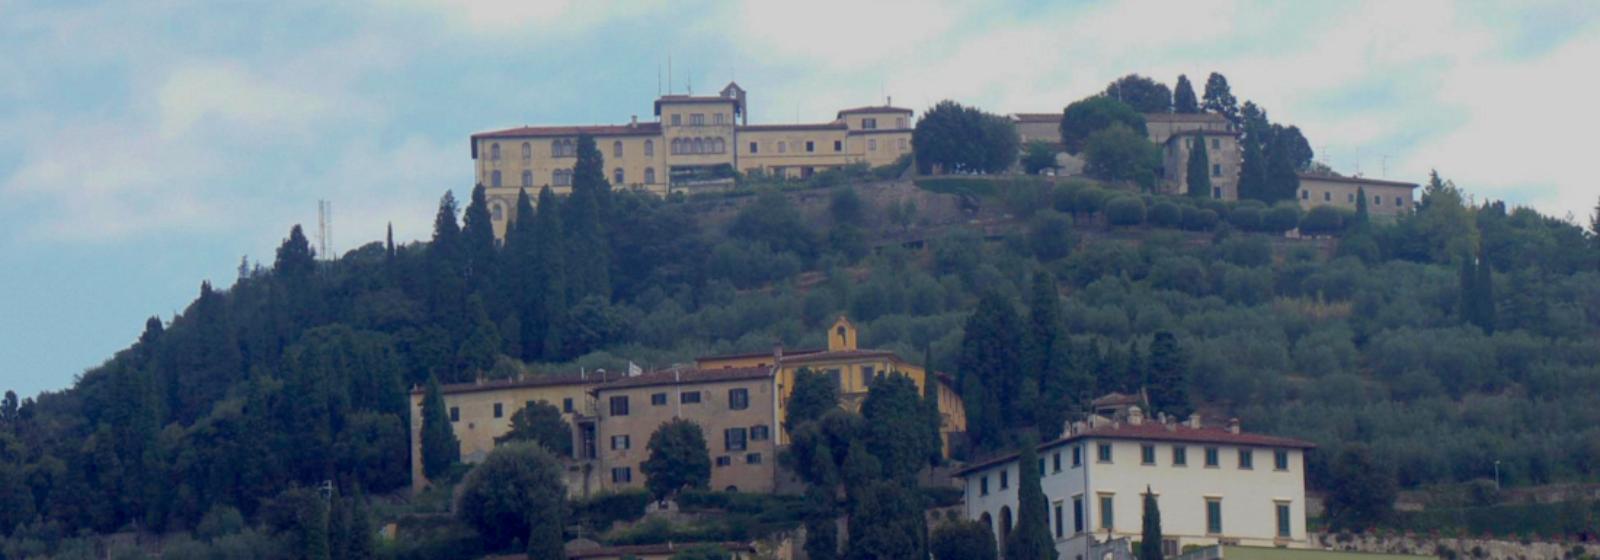 S. Francesco infermeria - Fiesole